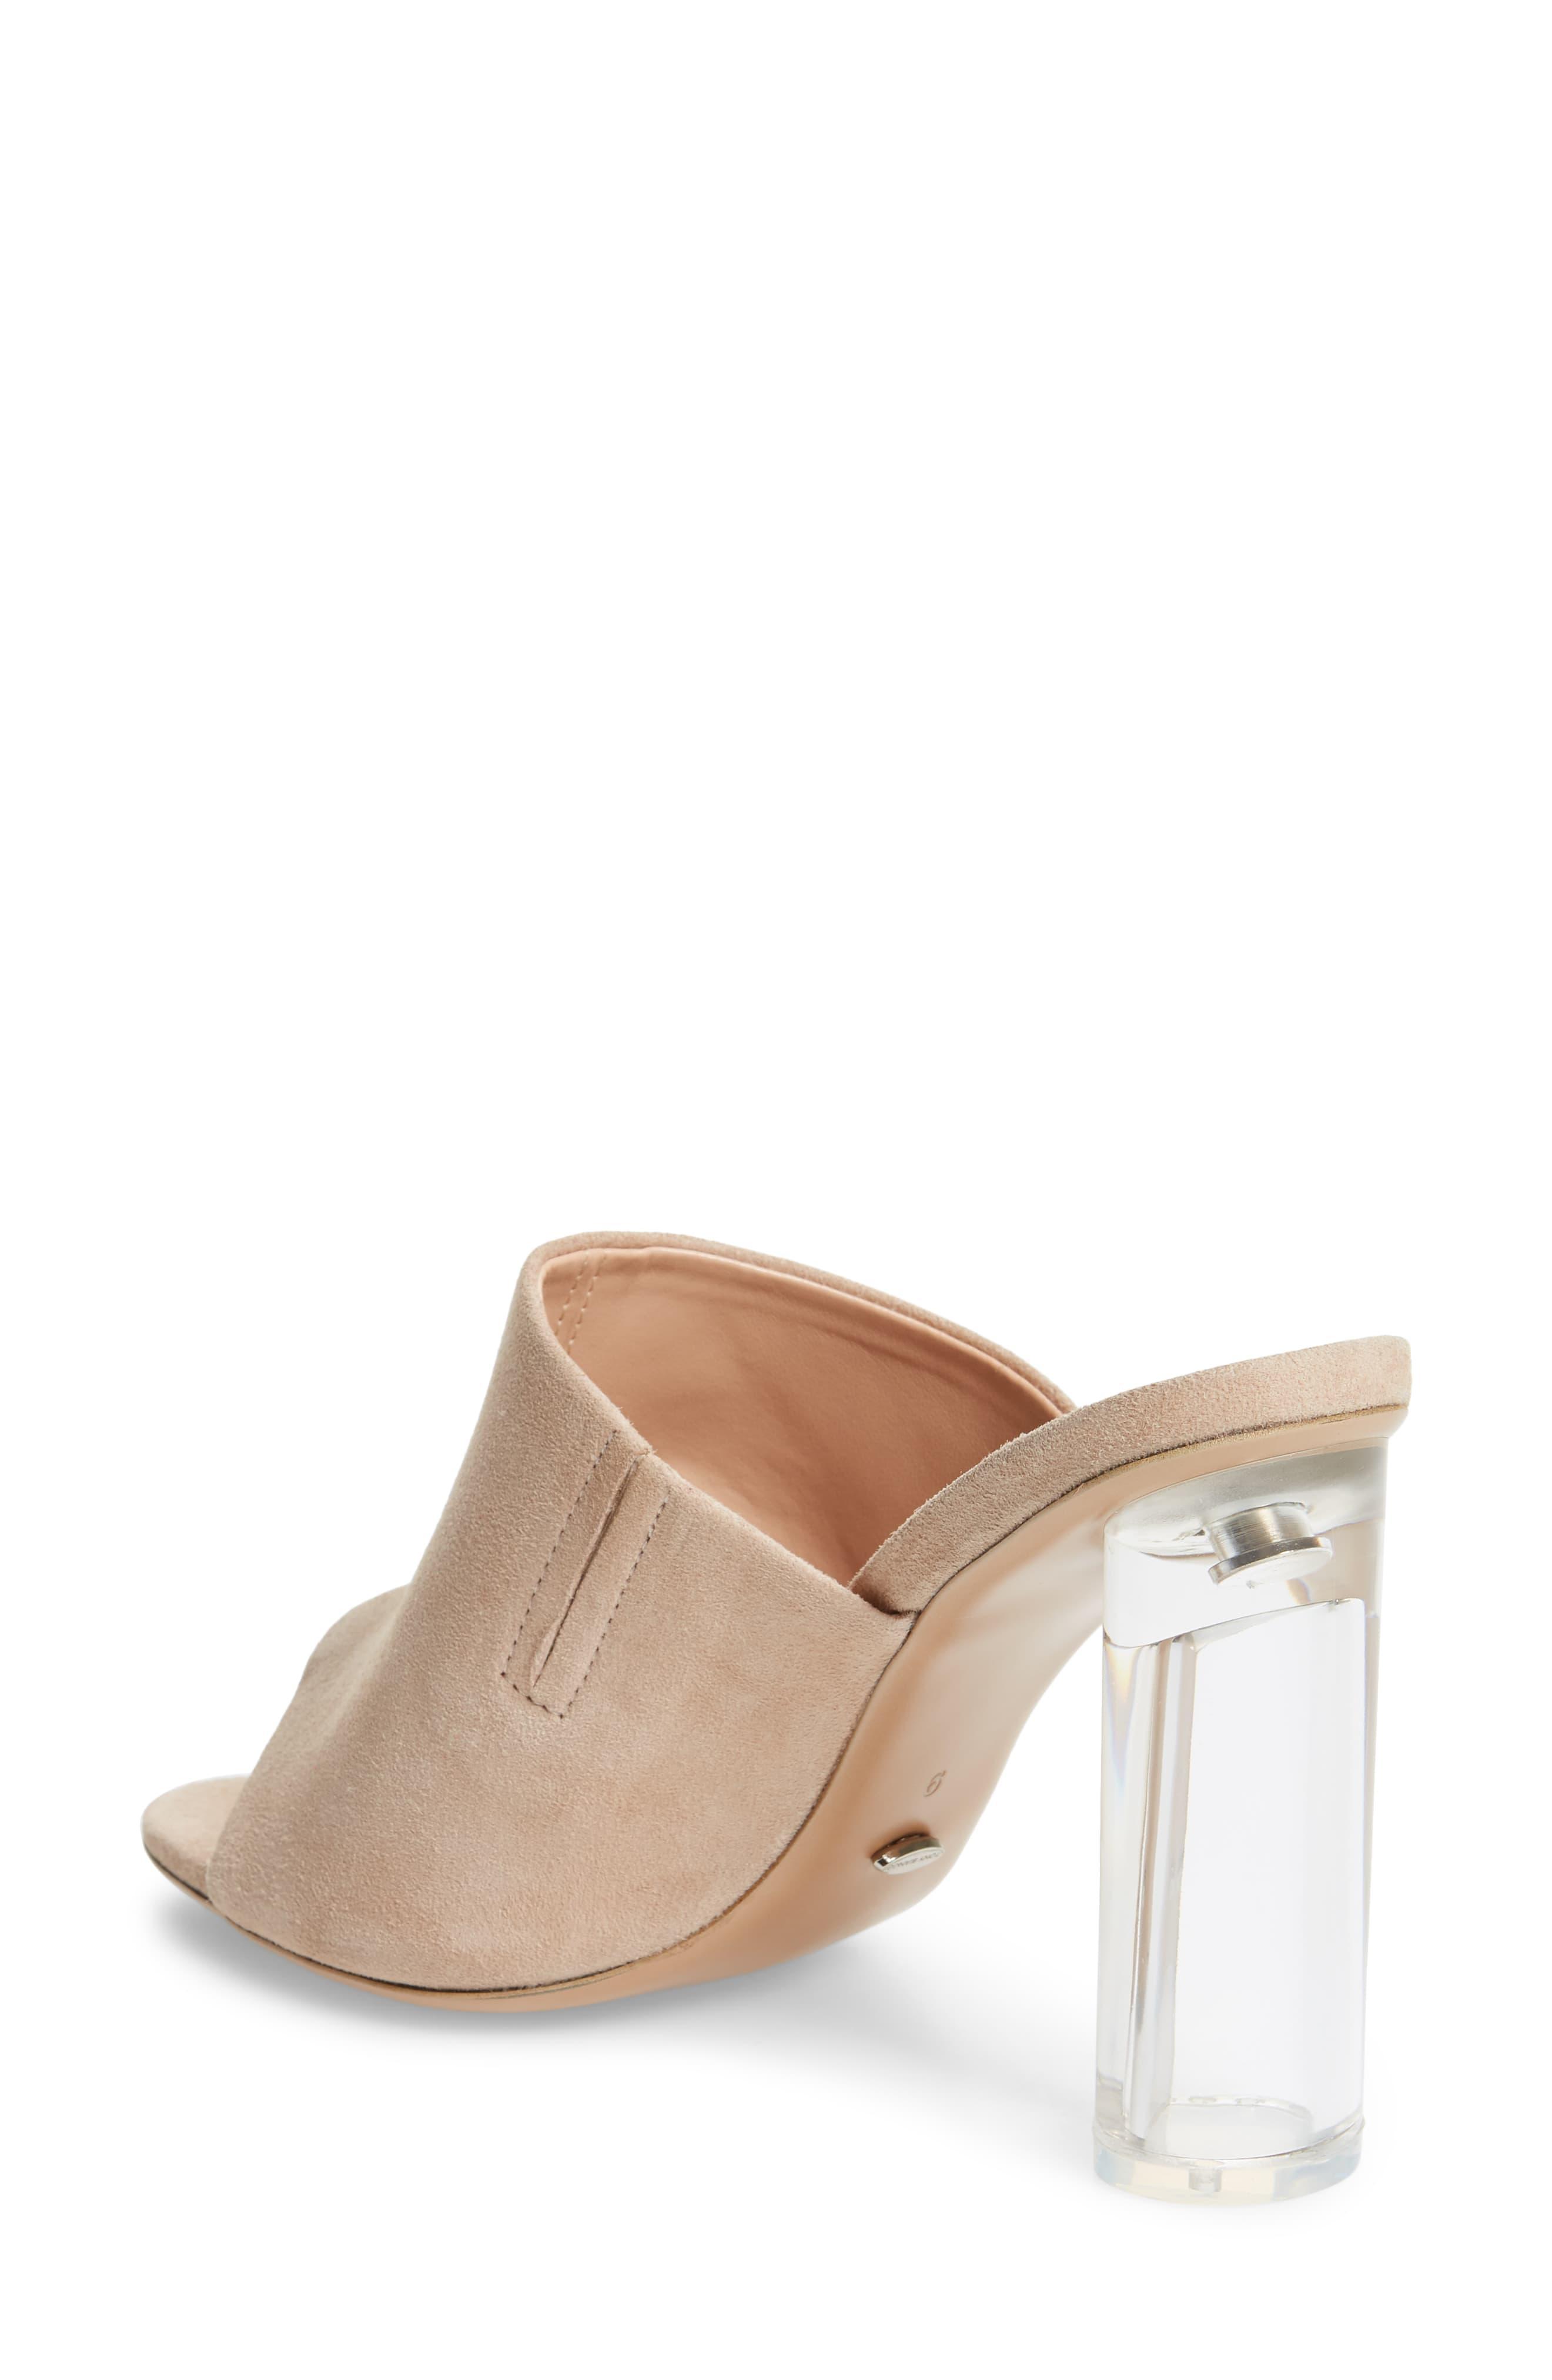 372543d00a Tony Bianco Takoda Clear Heel Slide Sandal - Lyst